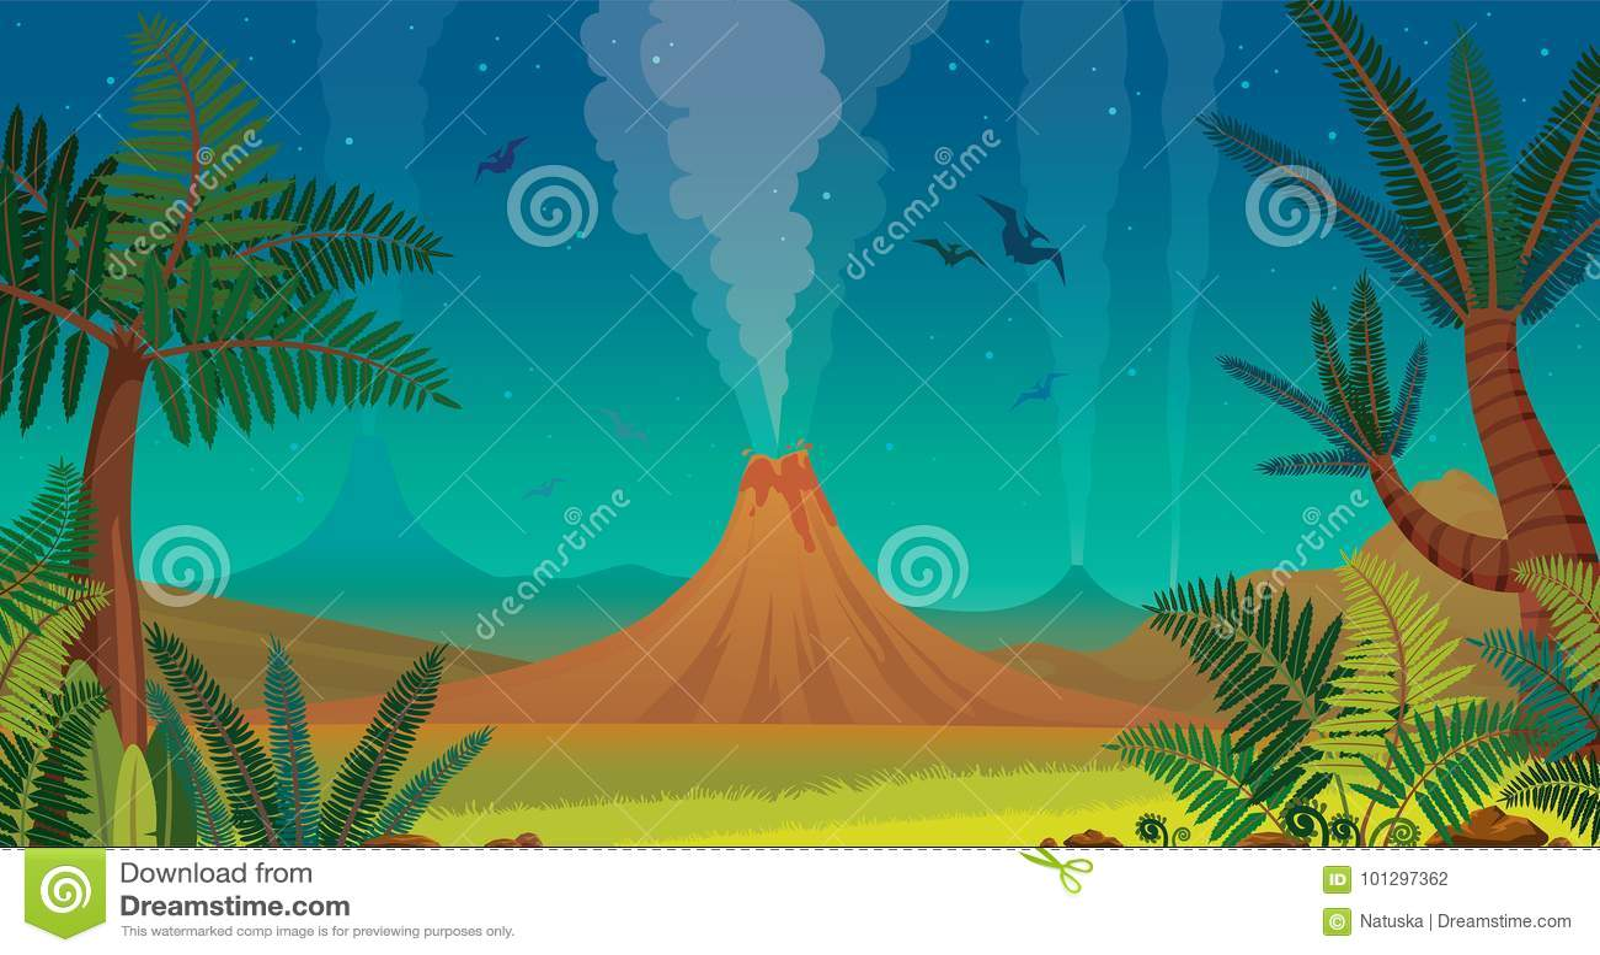 prehistoric nature volcano pterodactyl fern and night